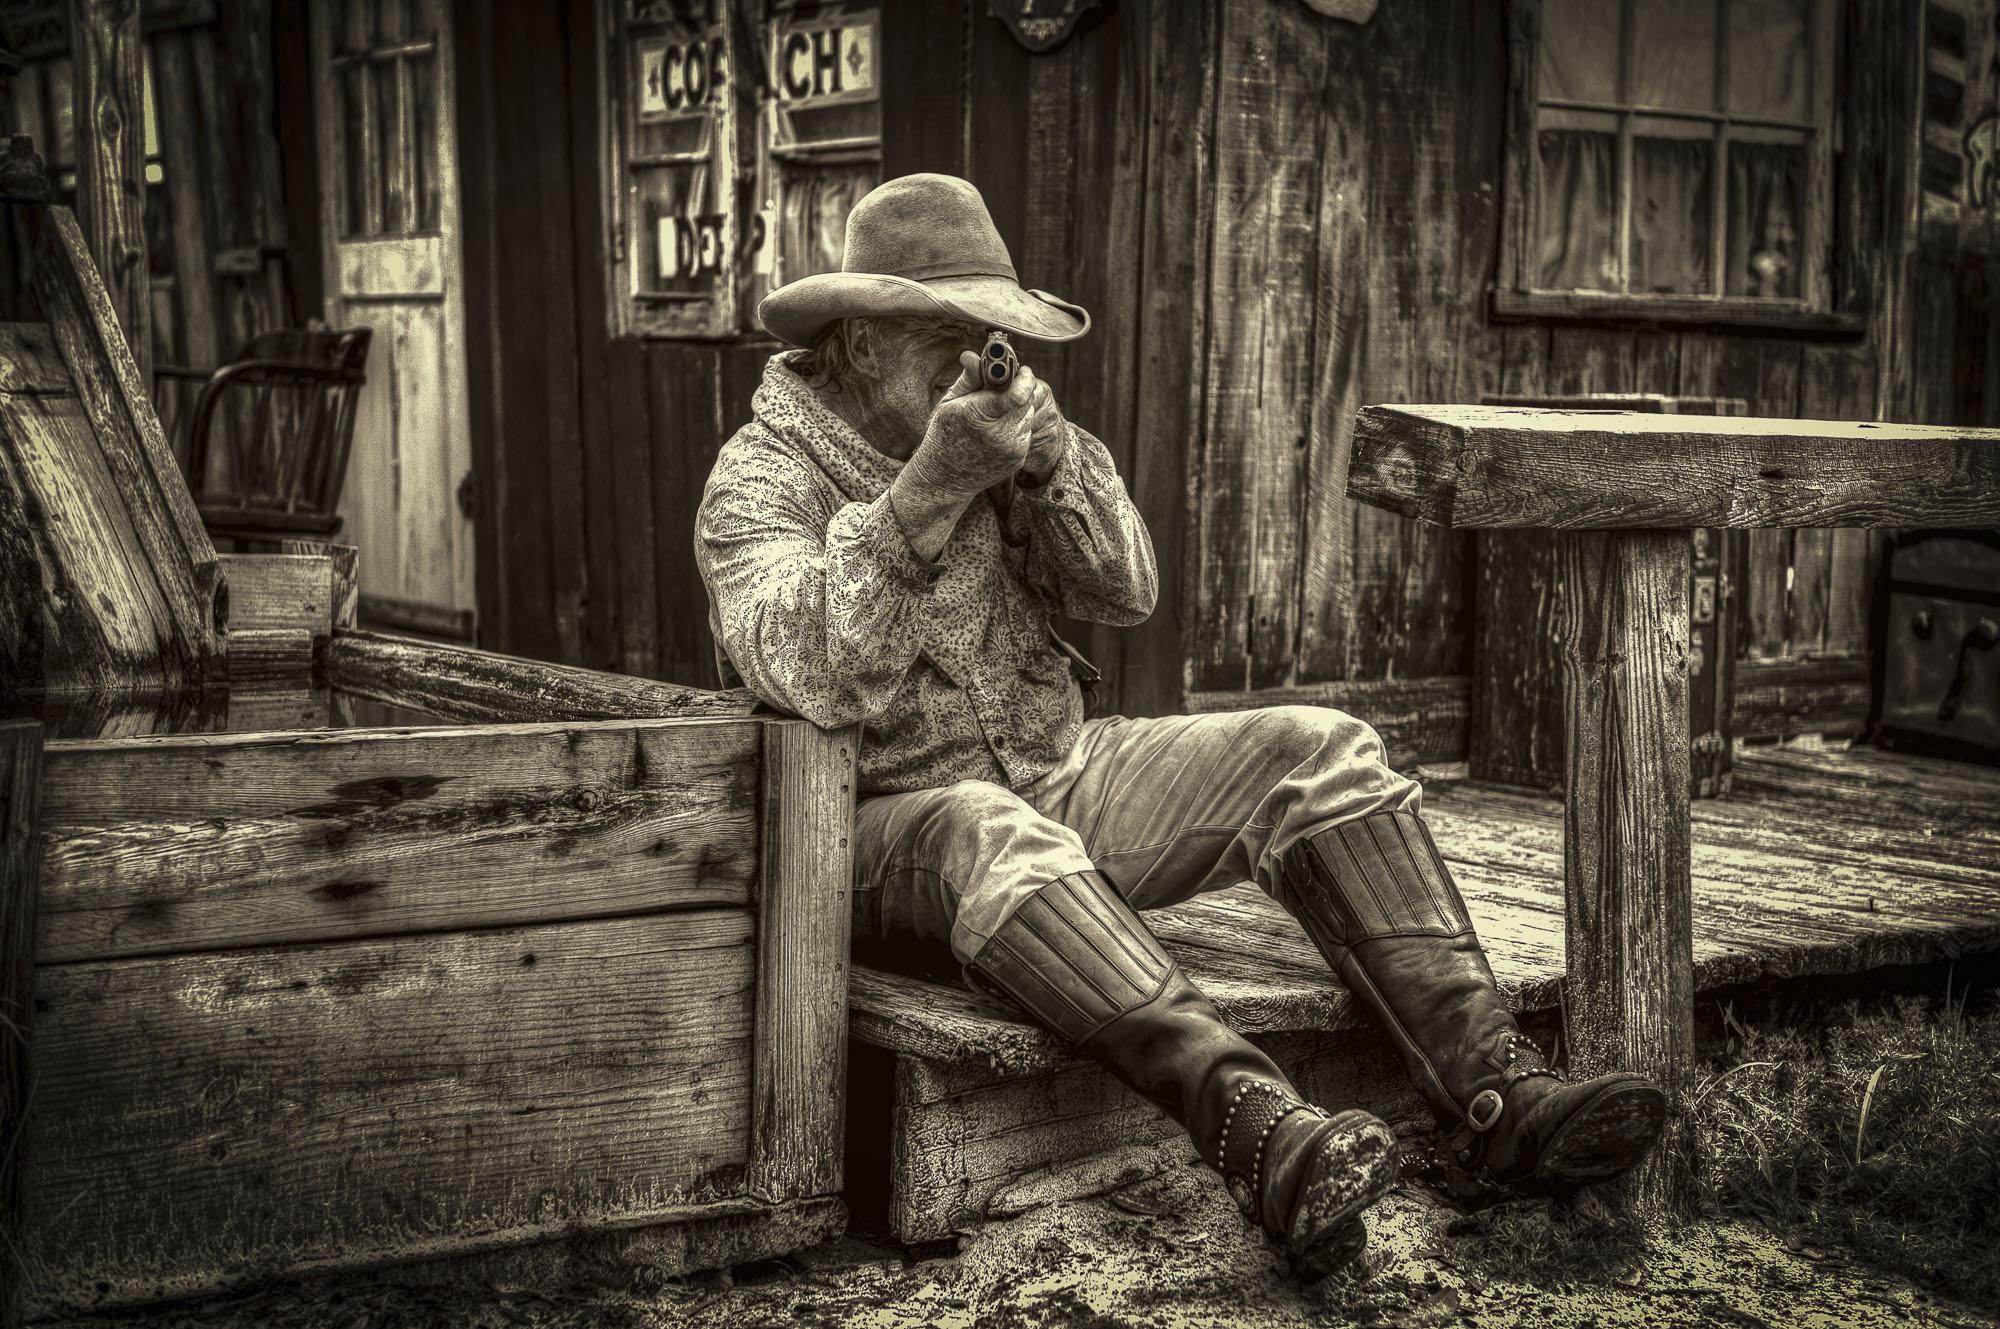 Gary Trabant